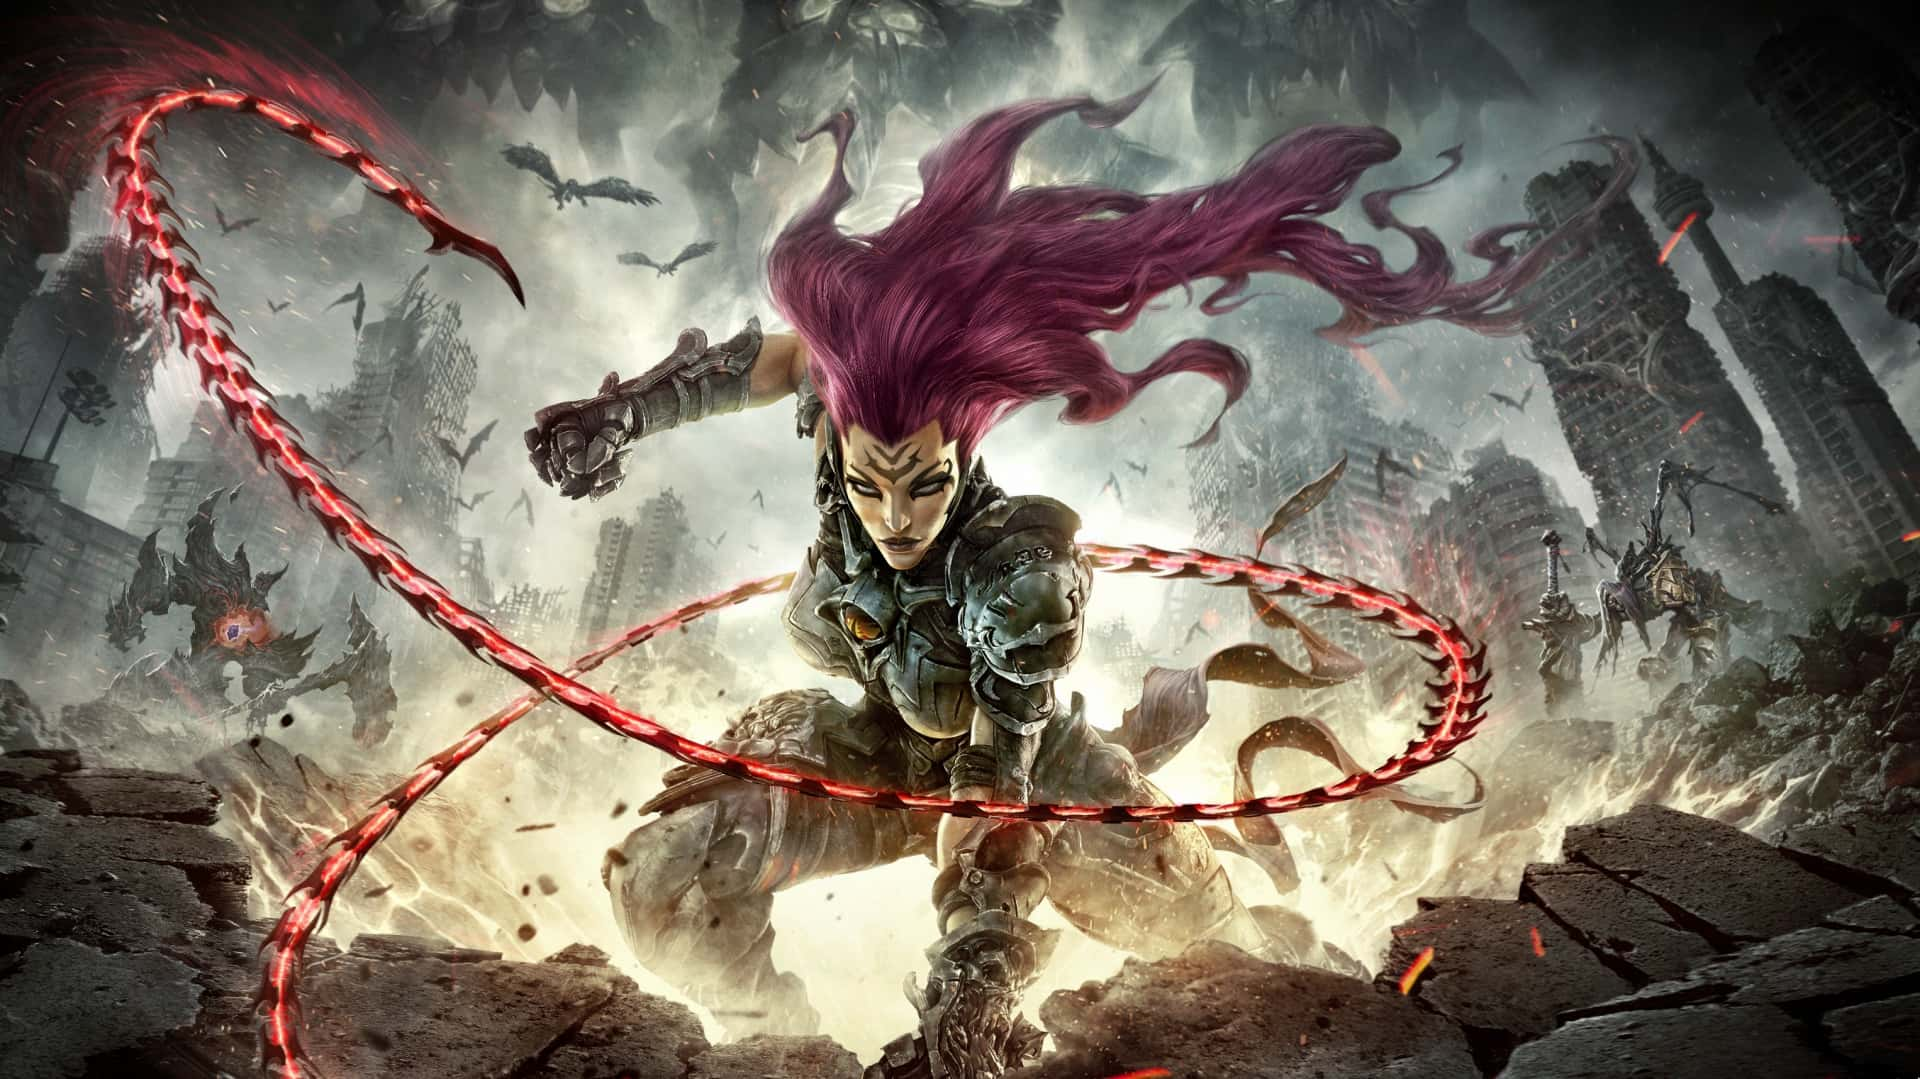 Darksiders III THQ Nordic